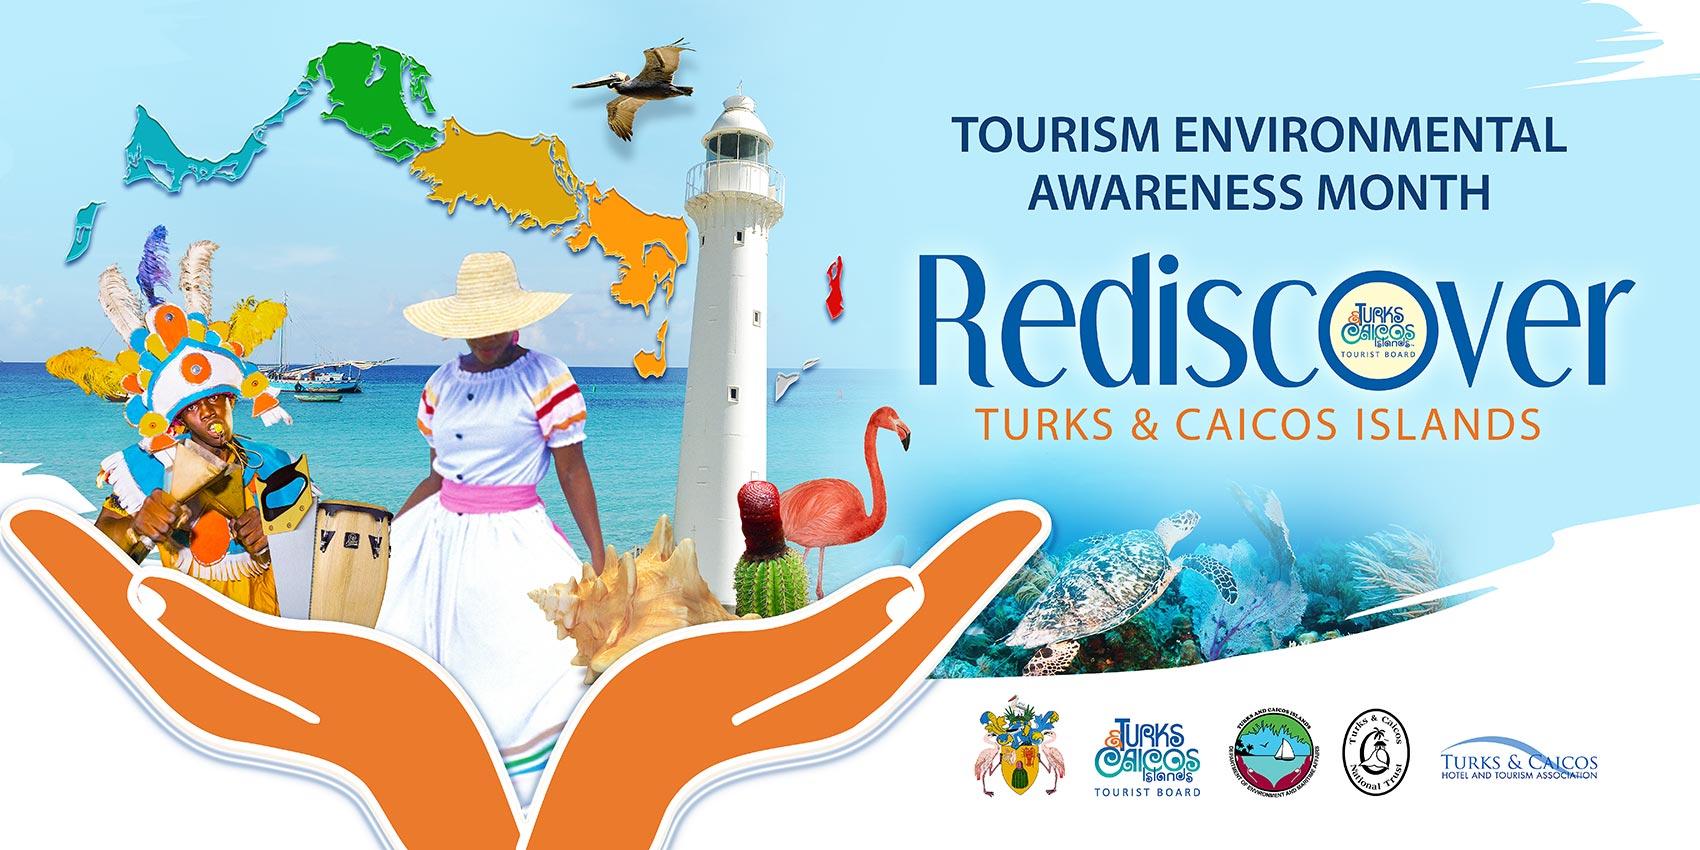 Discover Turks and Caicos Islands